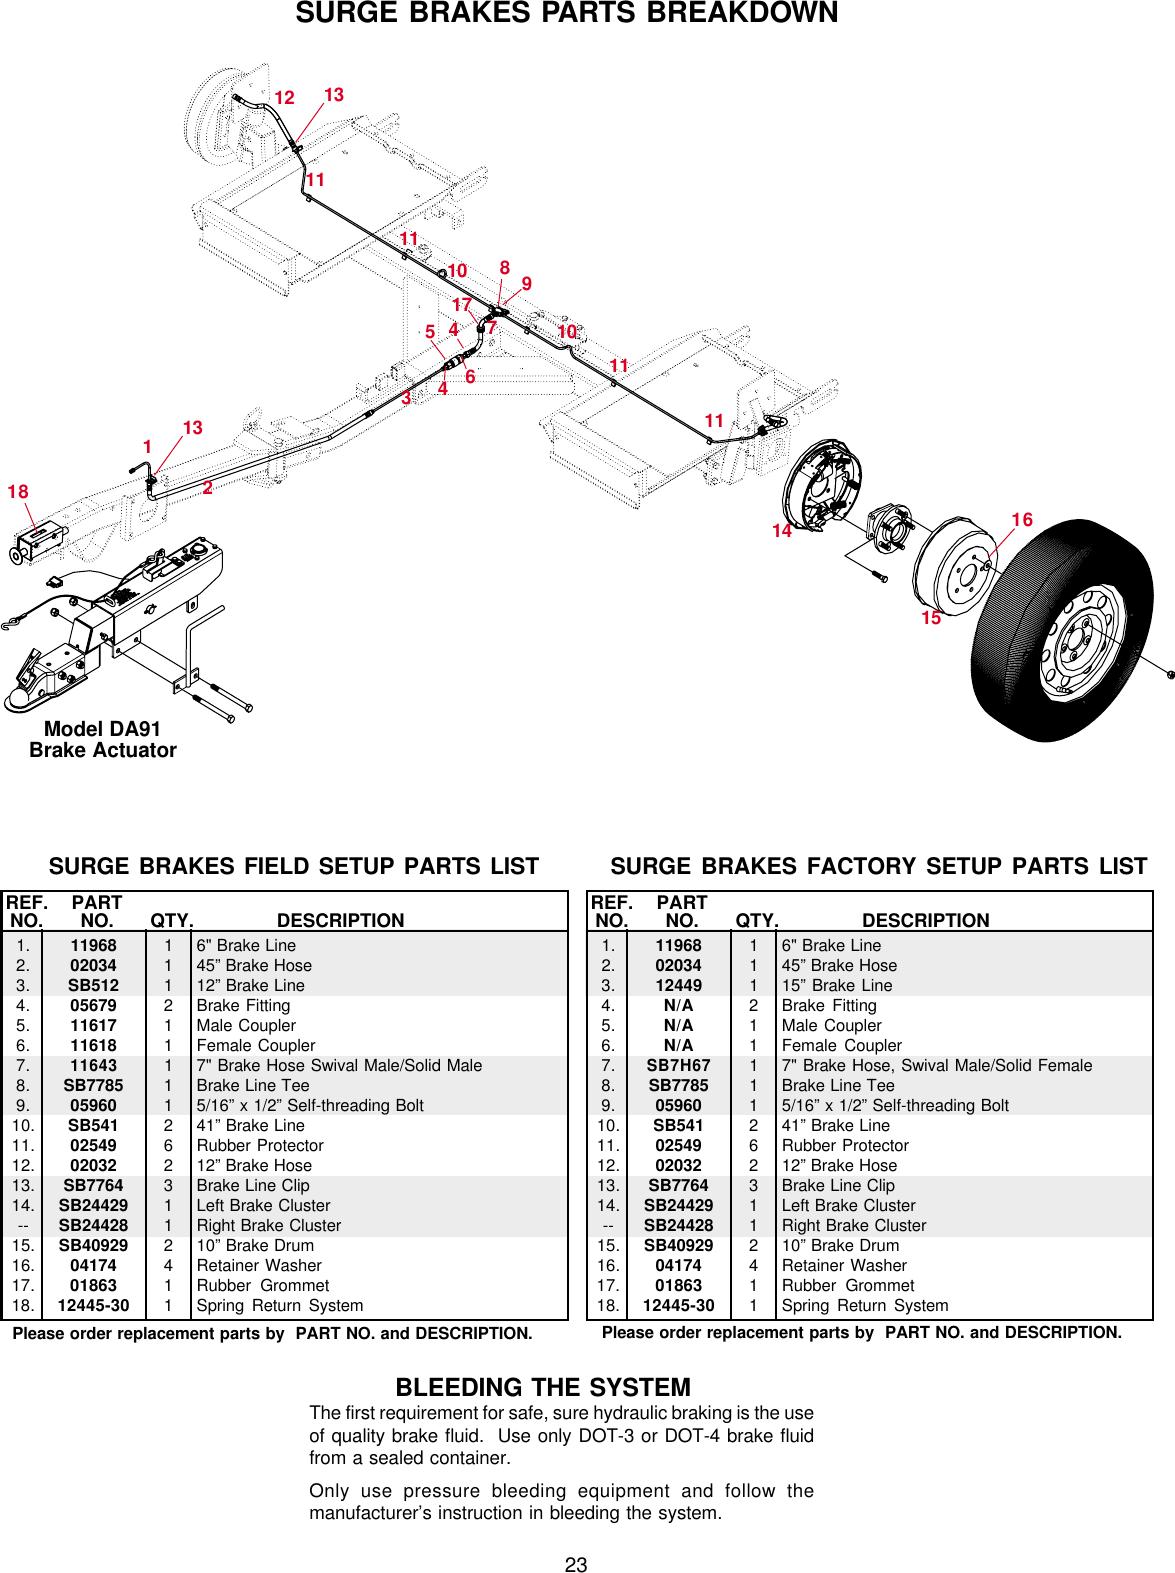 Brake System Parts List